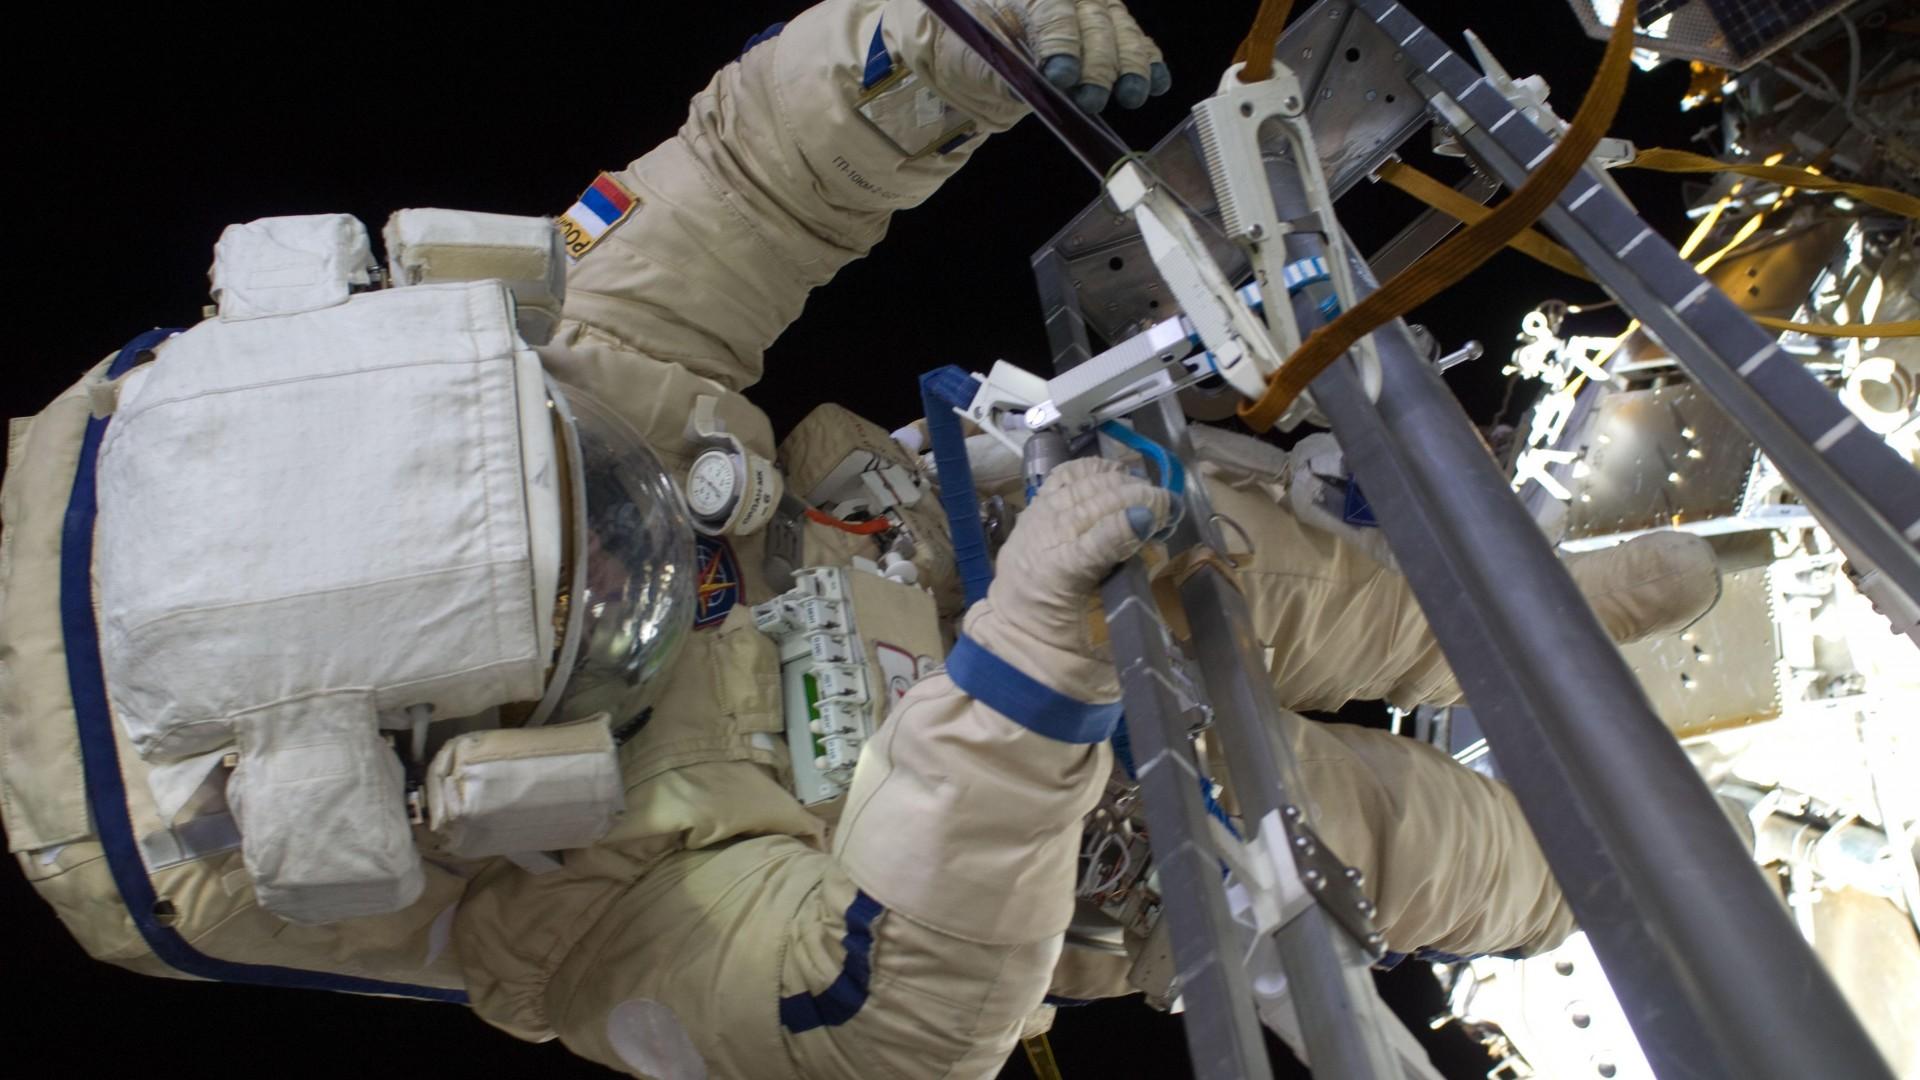 космонавт, скафандр, костям